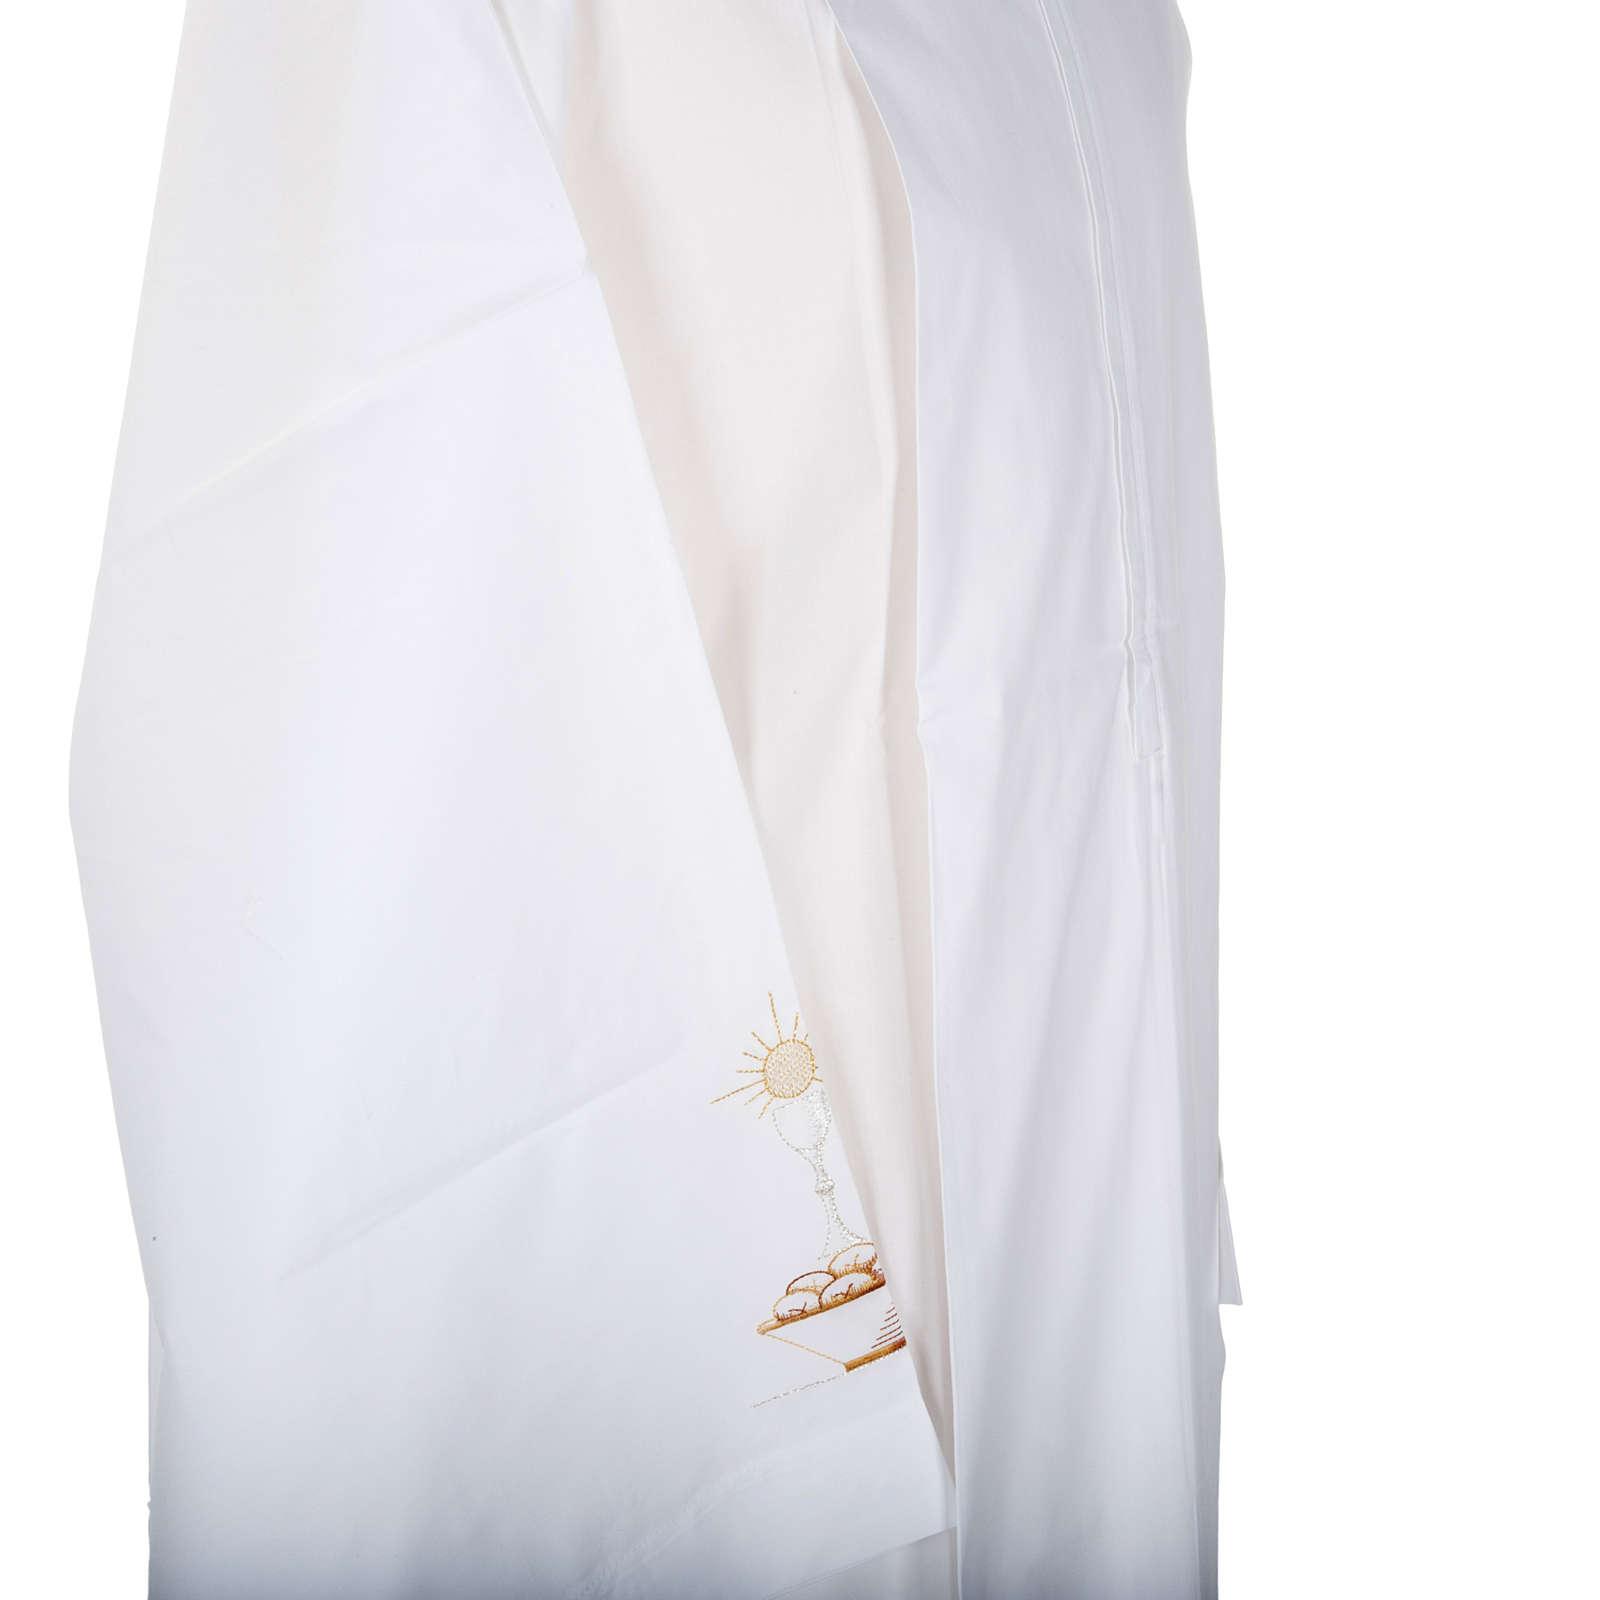 Camice bianco lana calice pane 4